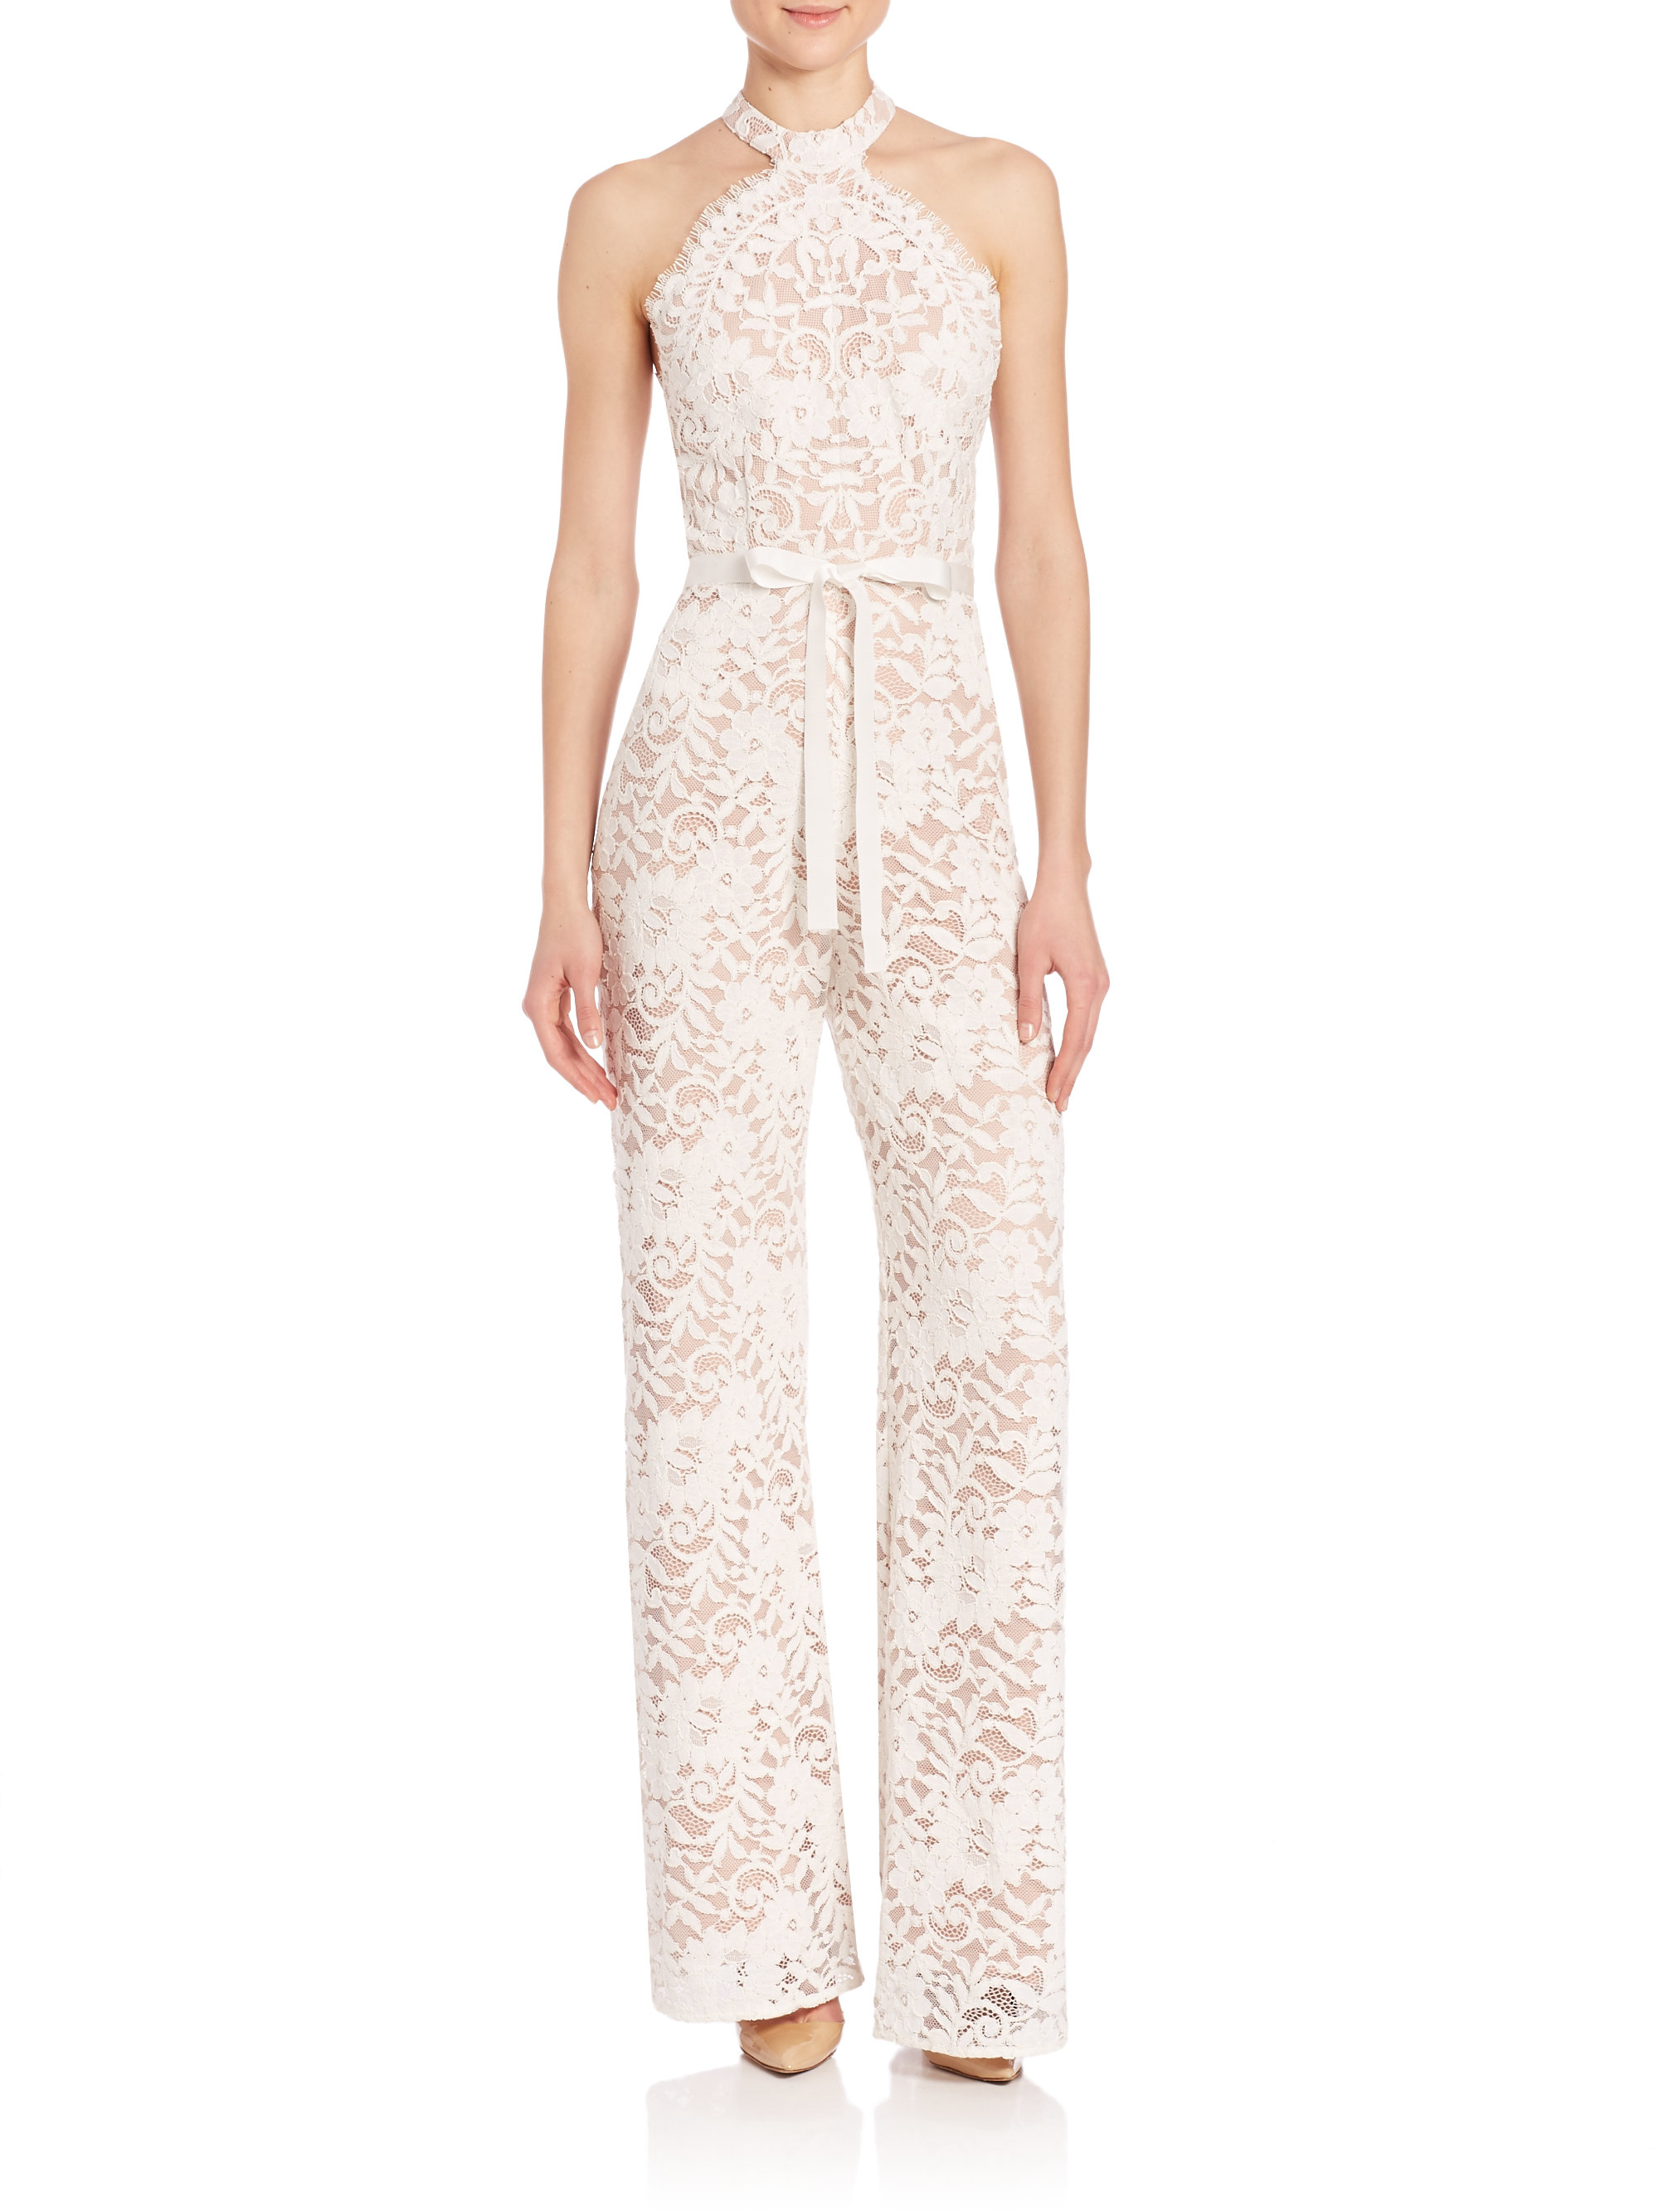 3833fe97688 Lyst alexis rene lace jumpsuit in white jpg 2000x2667 Alexis jumpsuit lace